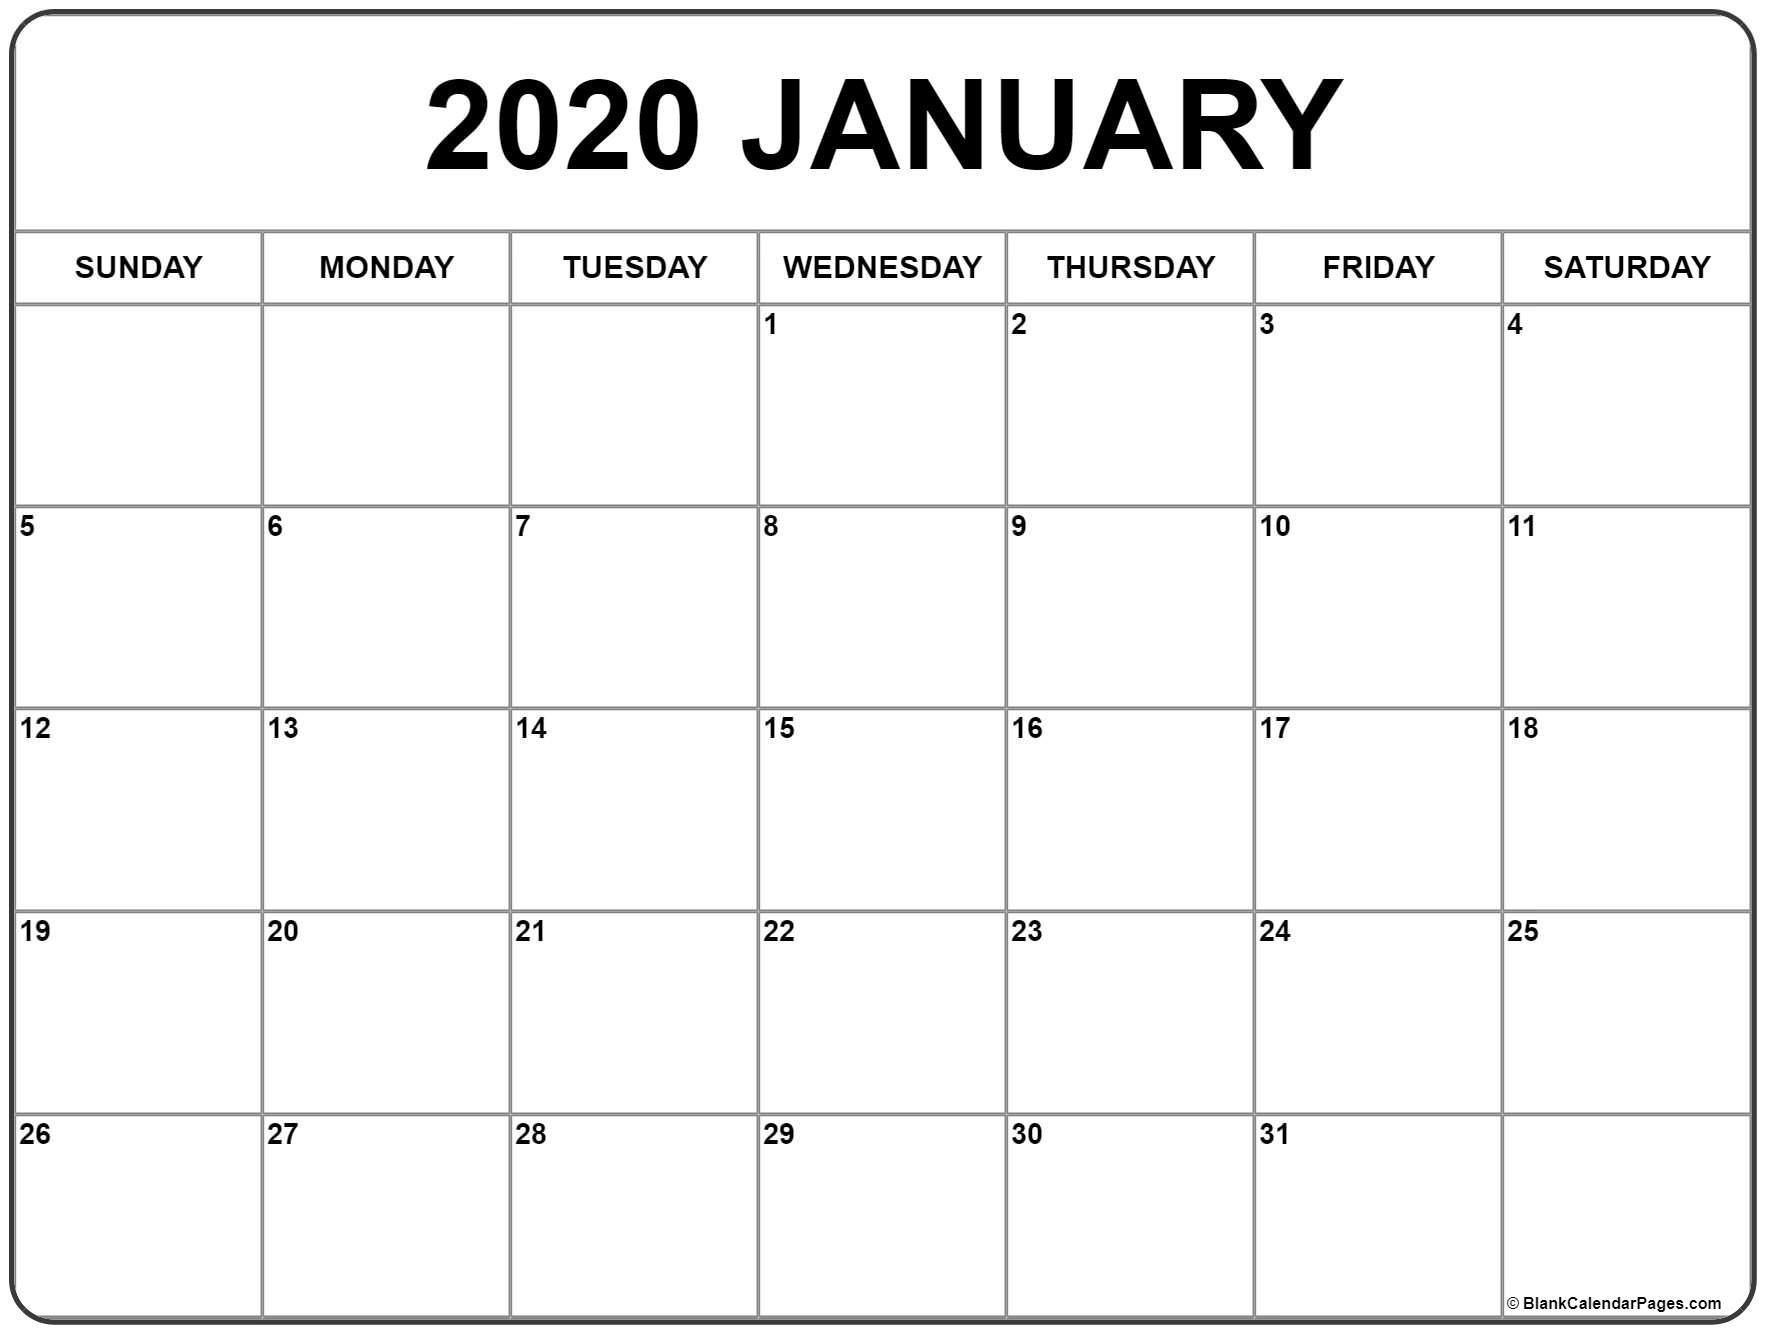 January 2020 Calendar | Free Printable Monthly Calendars-January 2020 Calendar Editable